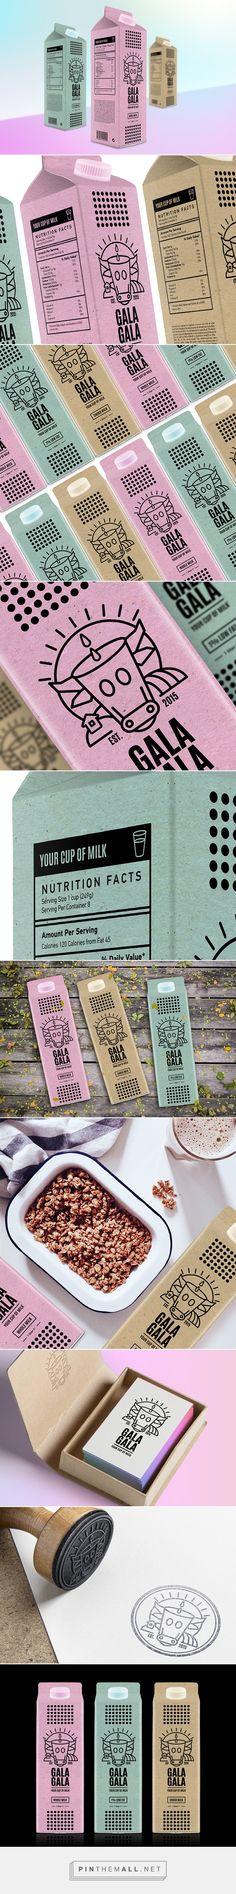 milk company | Gala Gala